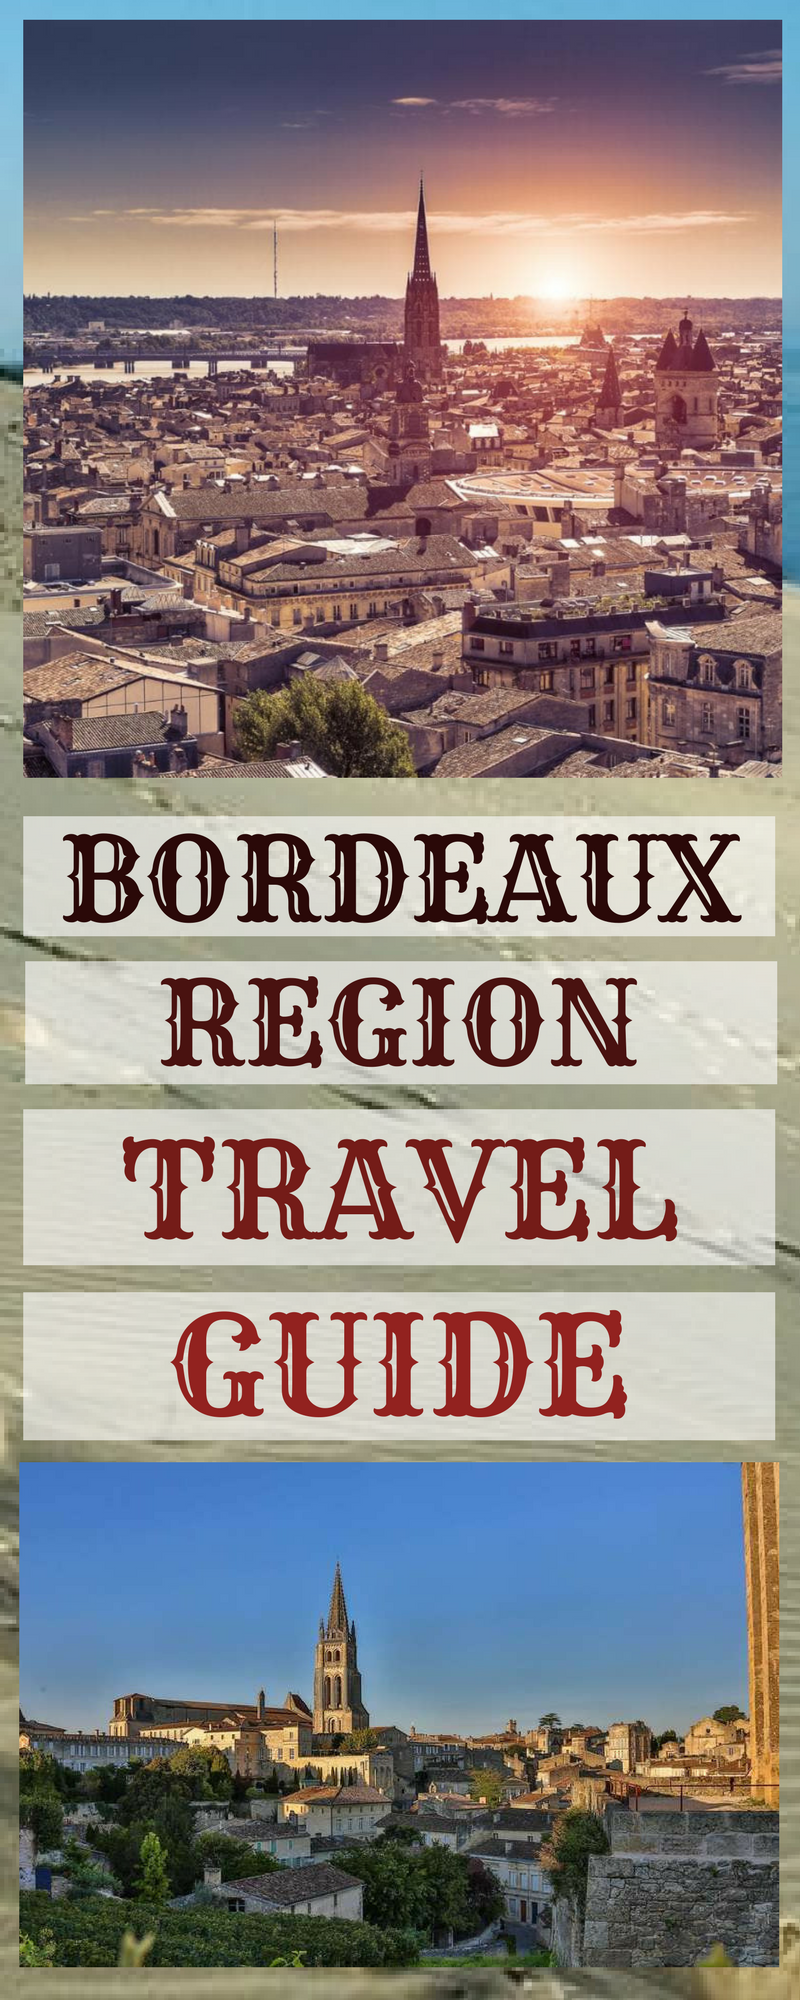 bordeaux region france